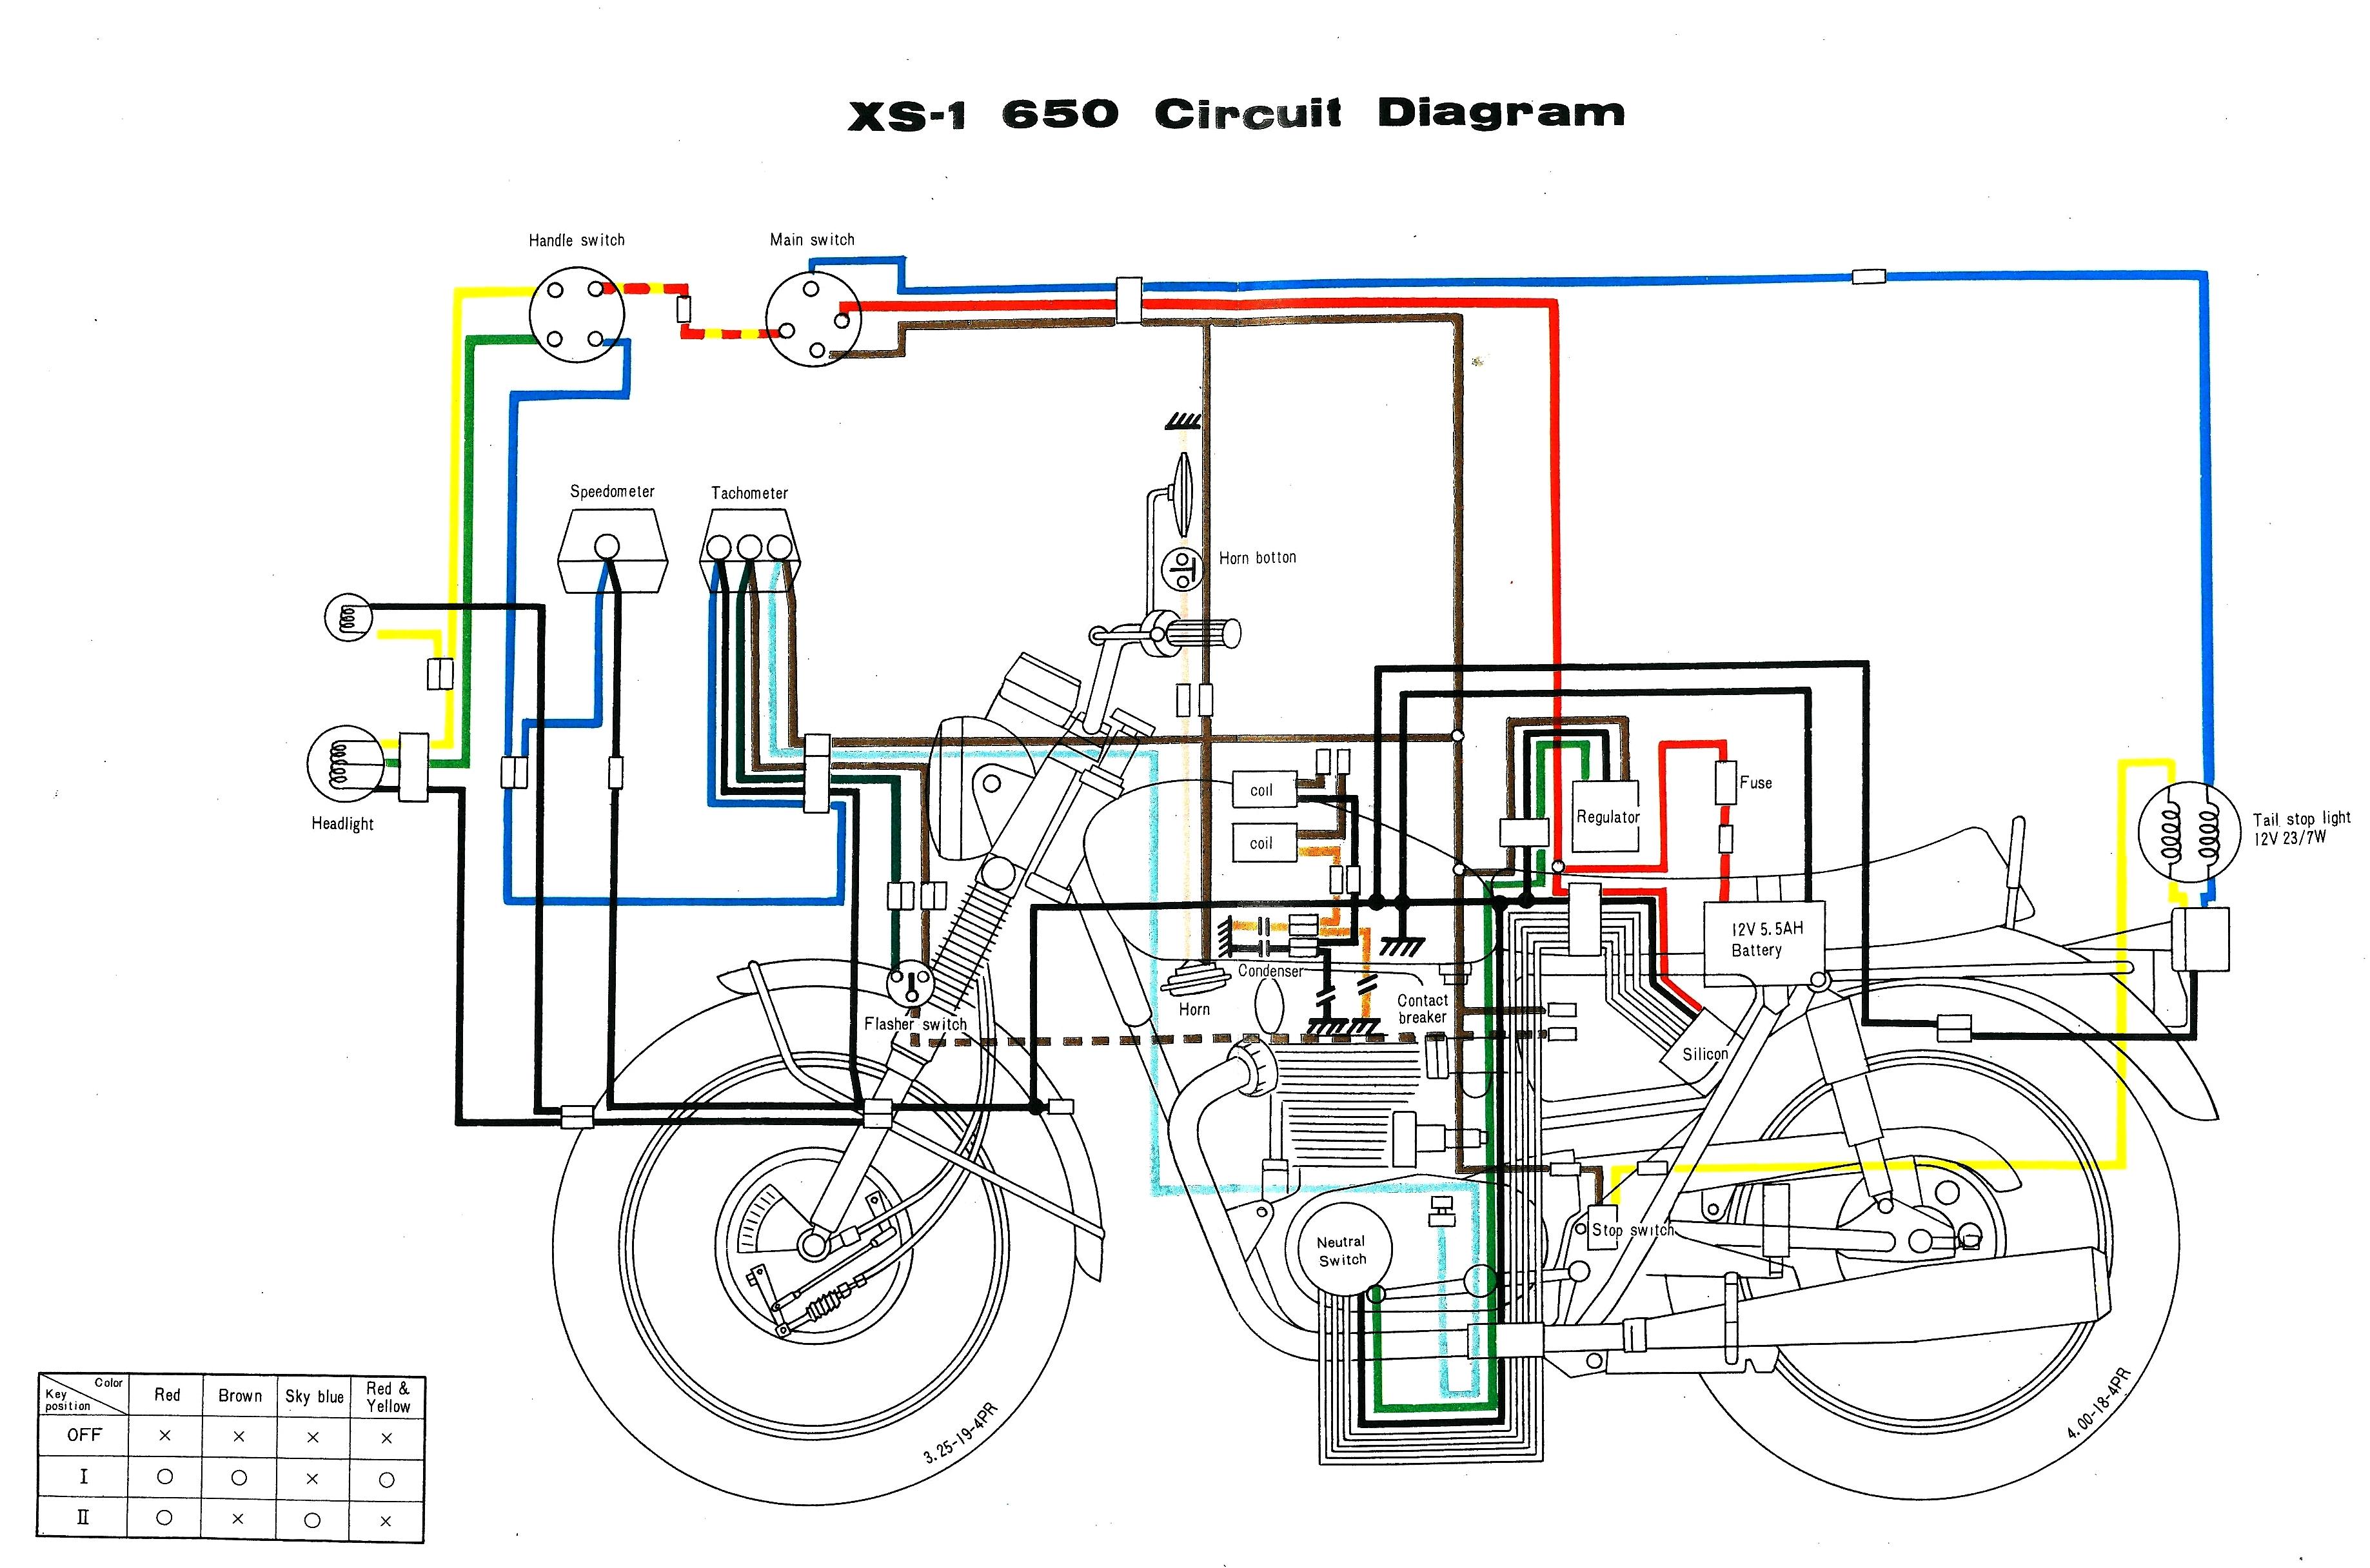 Yamaha Xs650 Wiring Harness Diagram | Manual E-Books - Xs650 Wiring Diagram